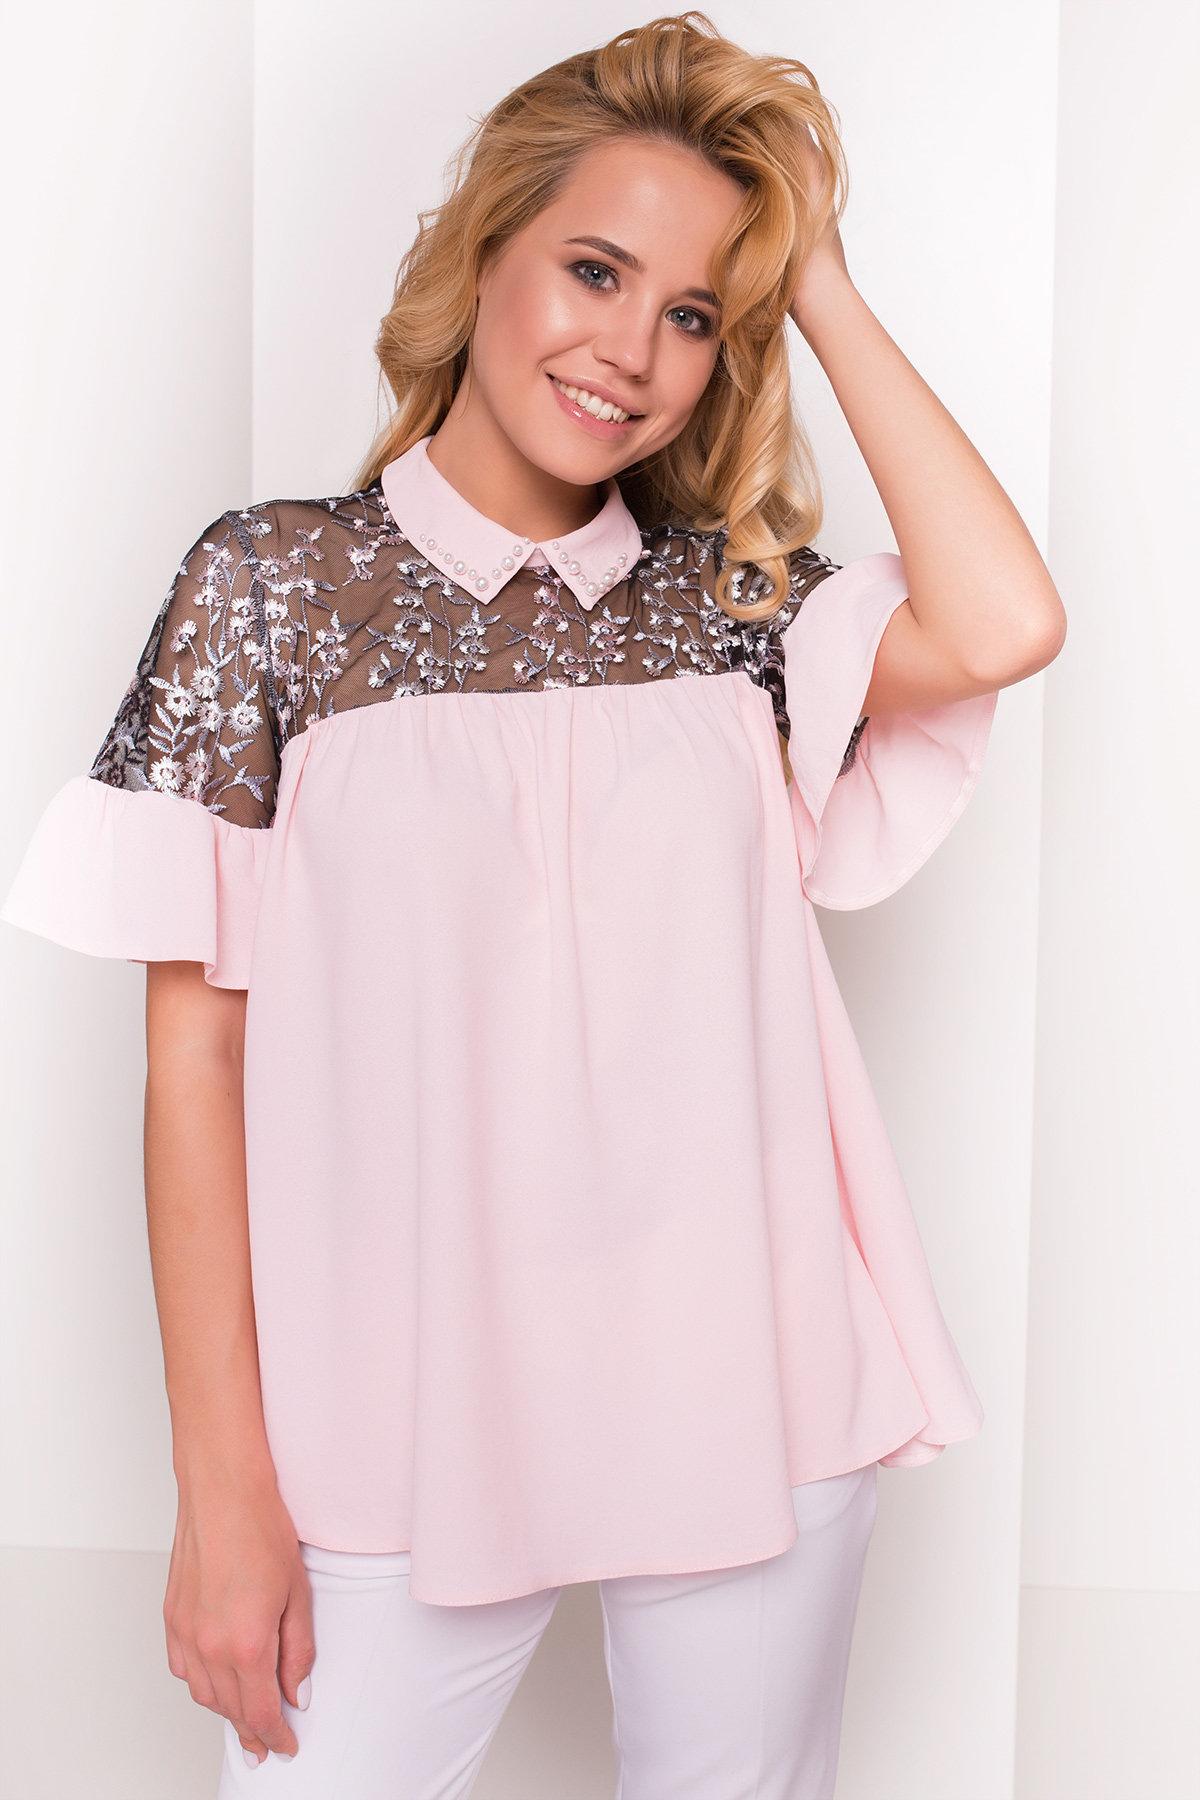 Оптом белые блузки от производителя Блуза Джету 5127